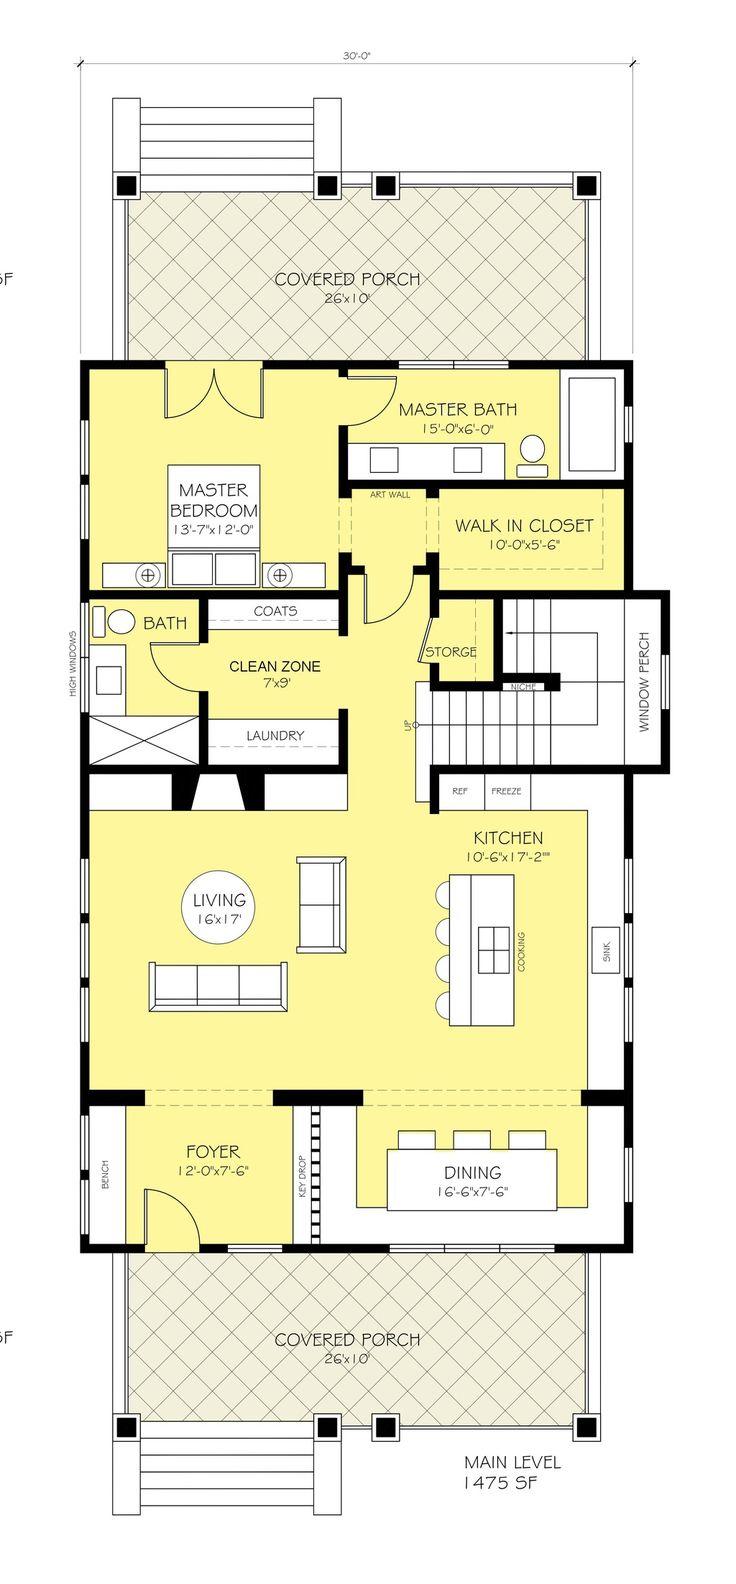 70 best great floor plans images on pinterest | architecture